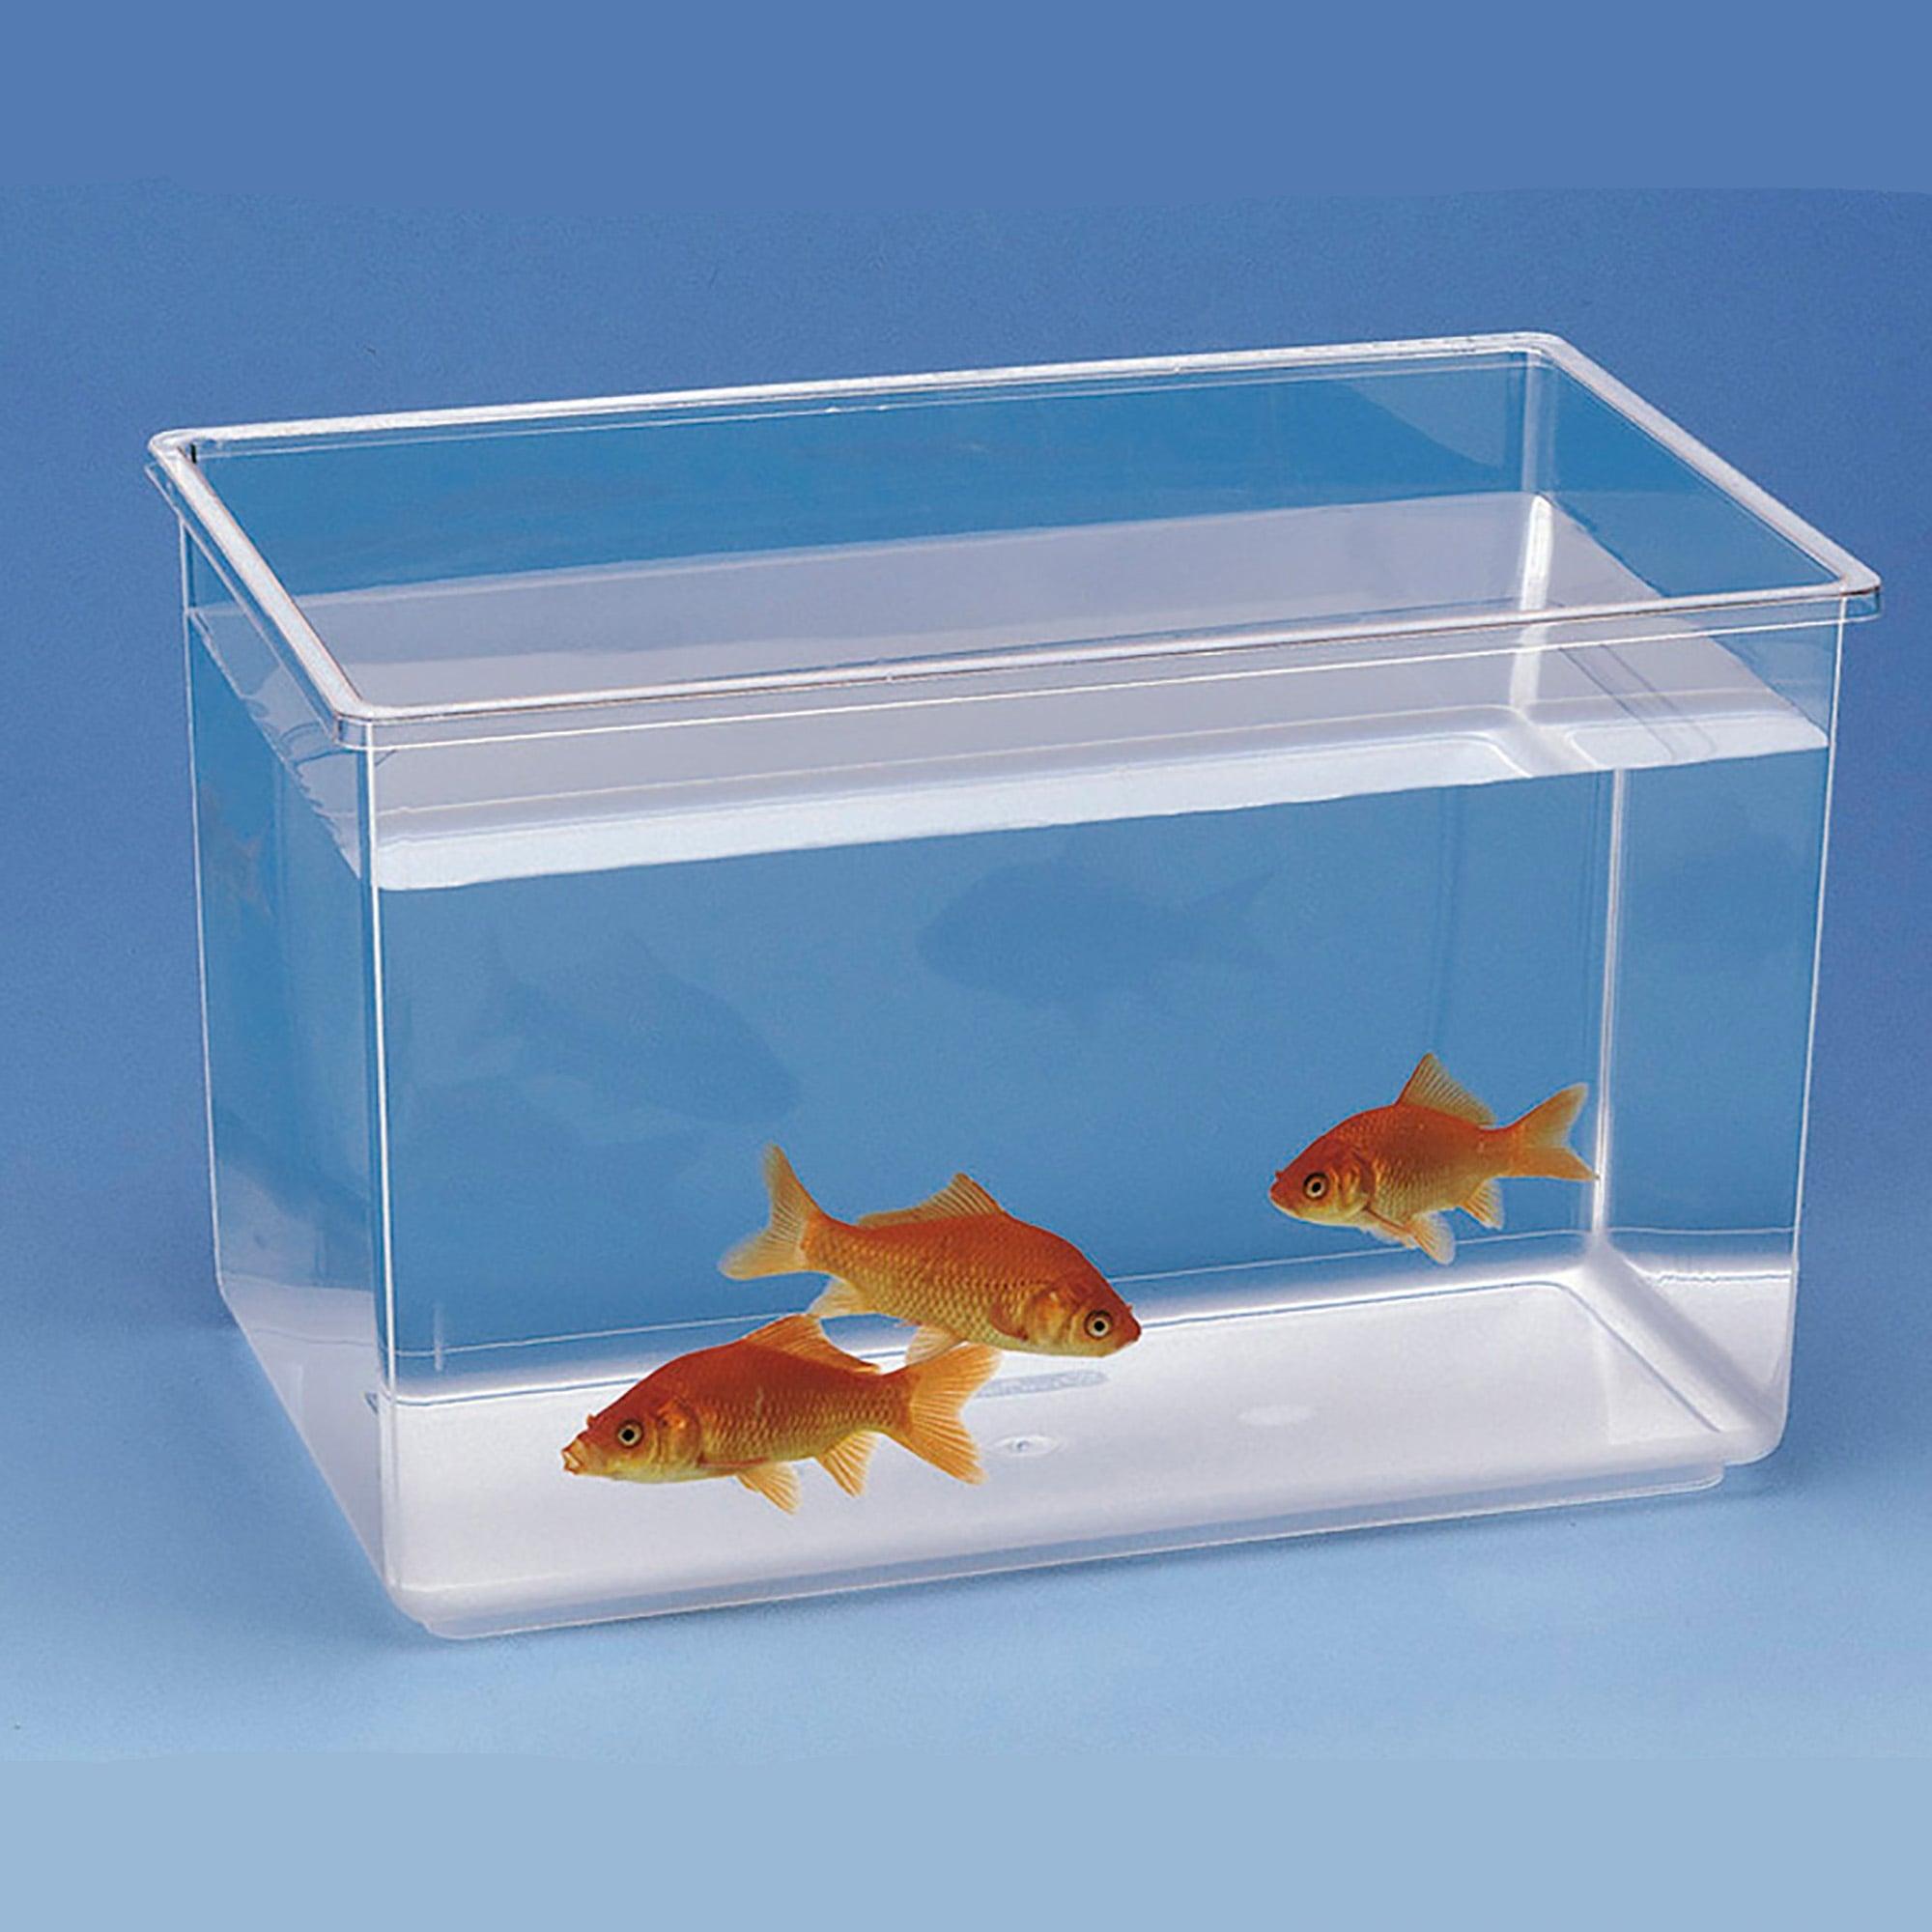 Ferplast Nettuno Plastic Fish Tank Extra Large Feedem